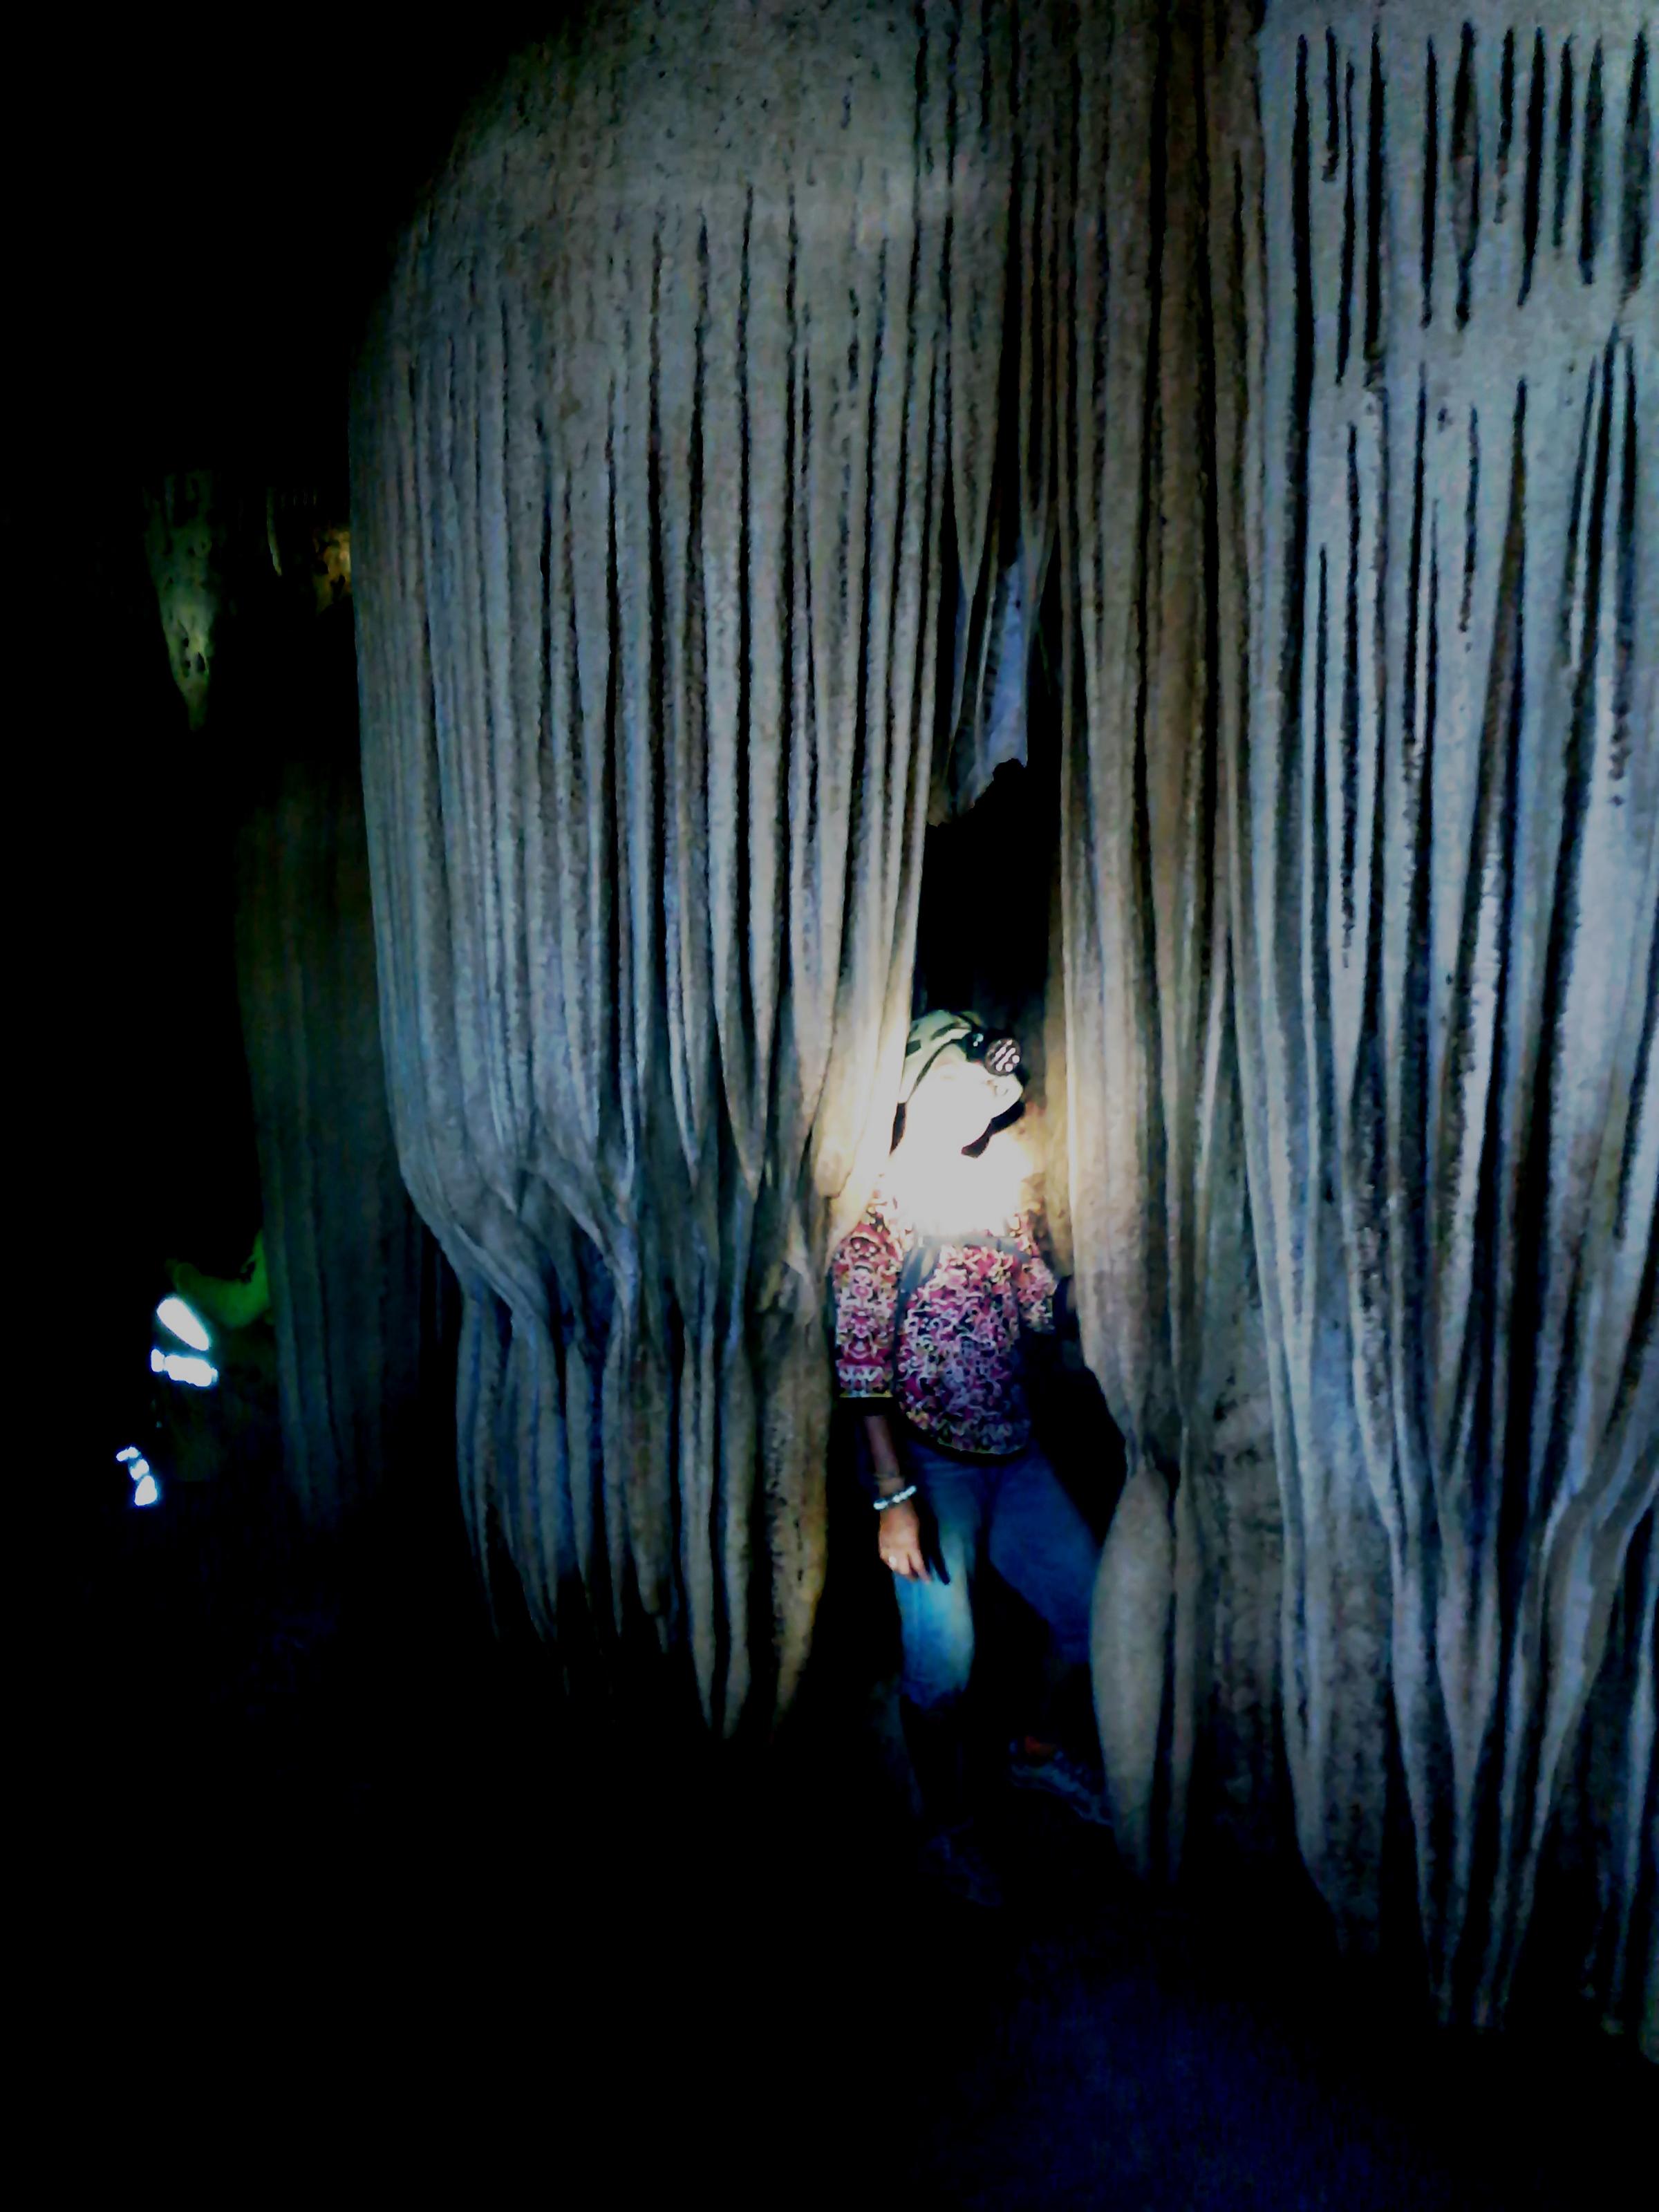 Inside the curtain